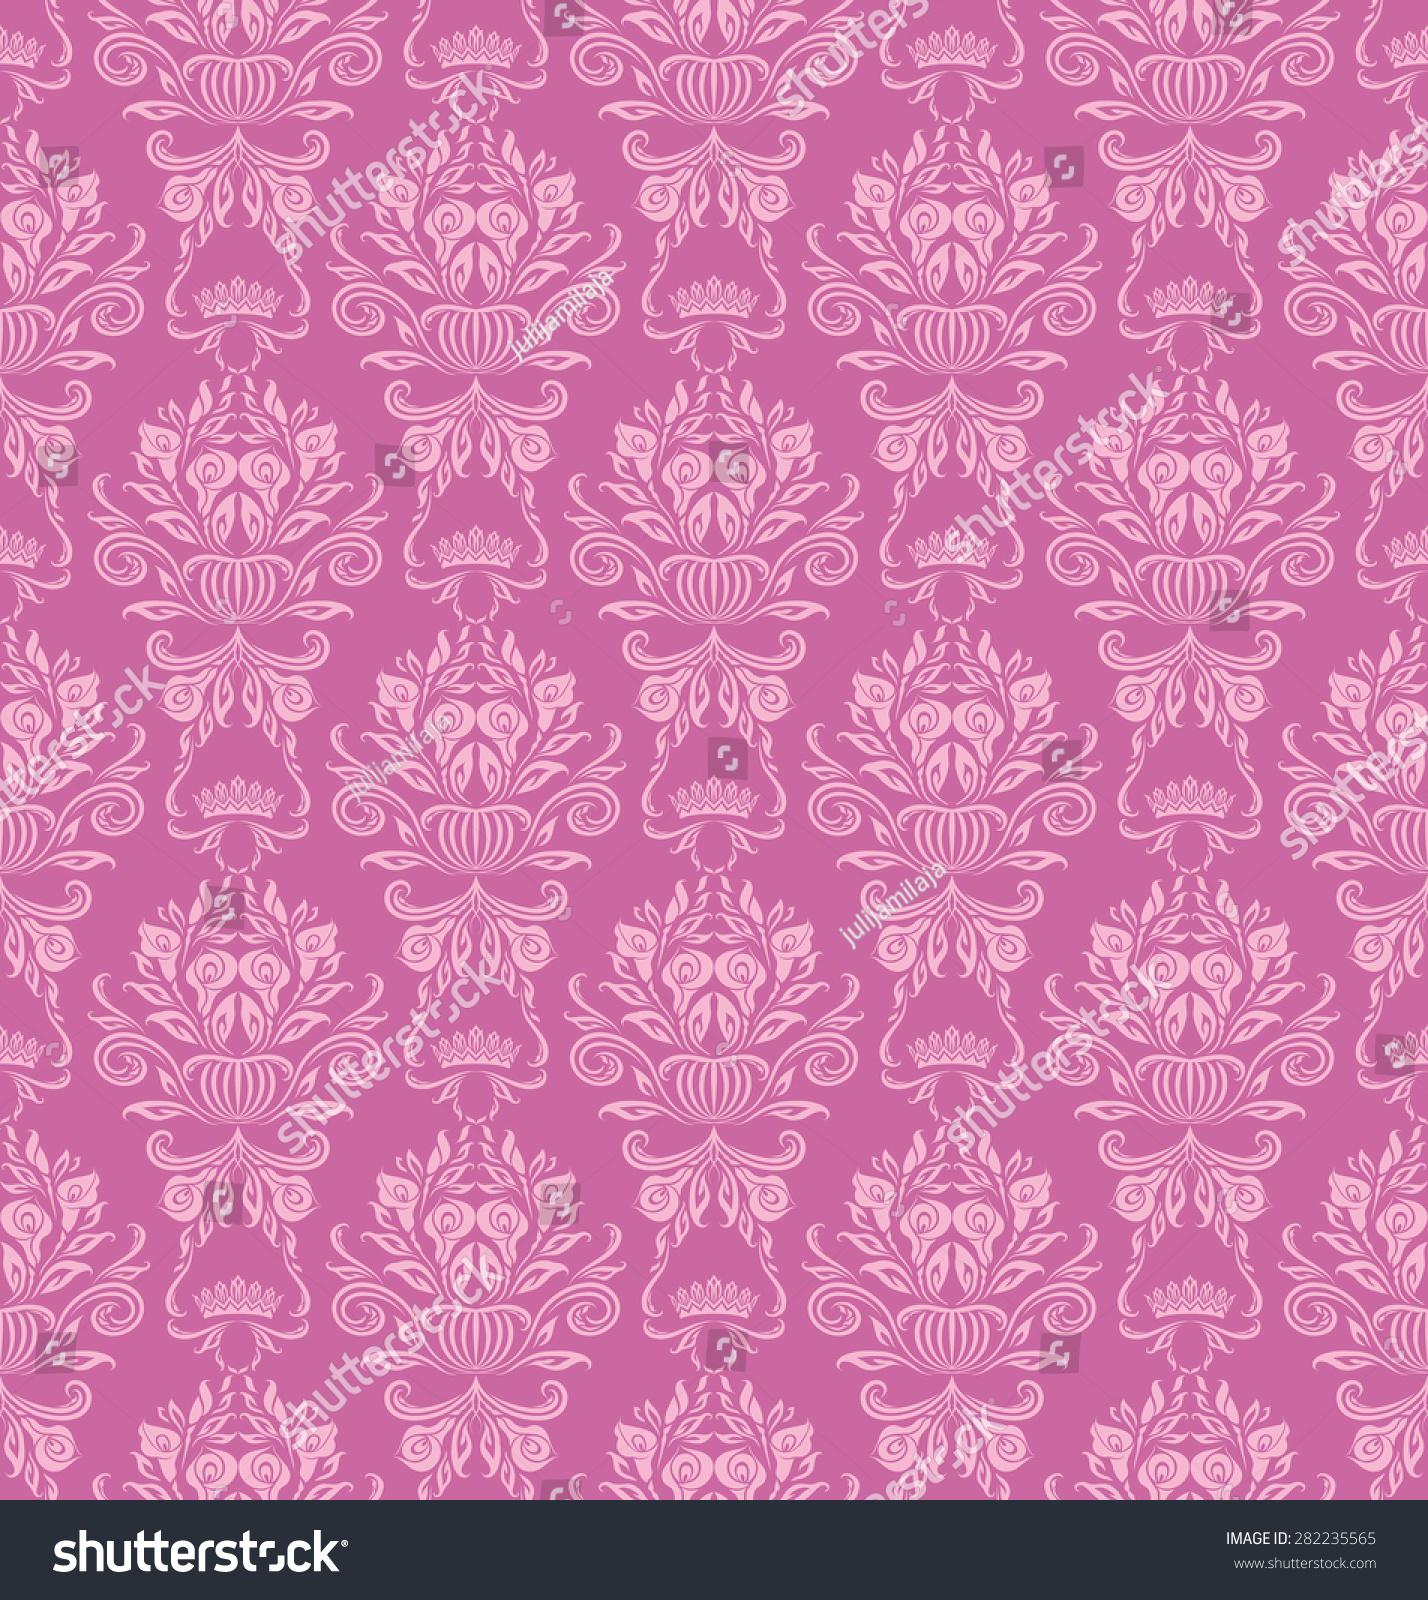 Damask Seamless Floral Pattern Royal Wallpaper Stock Illustration 282235565